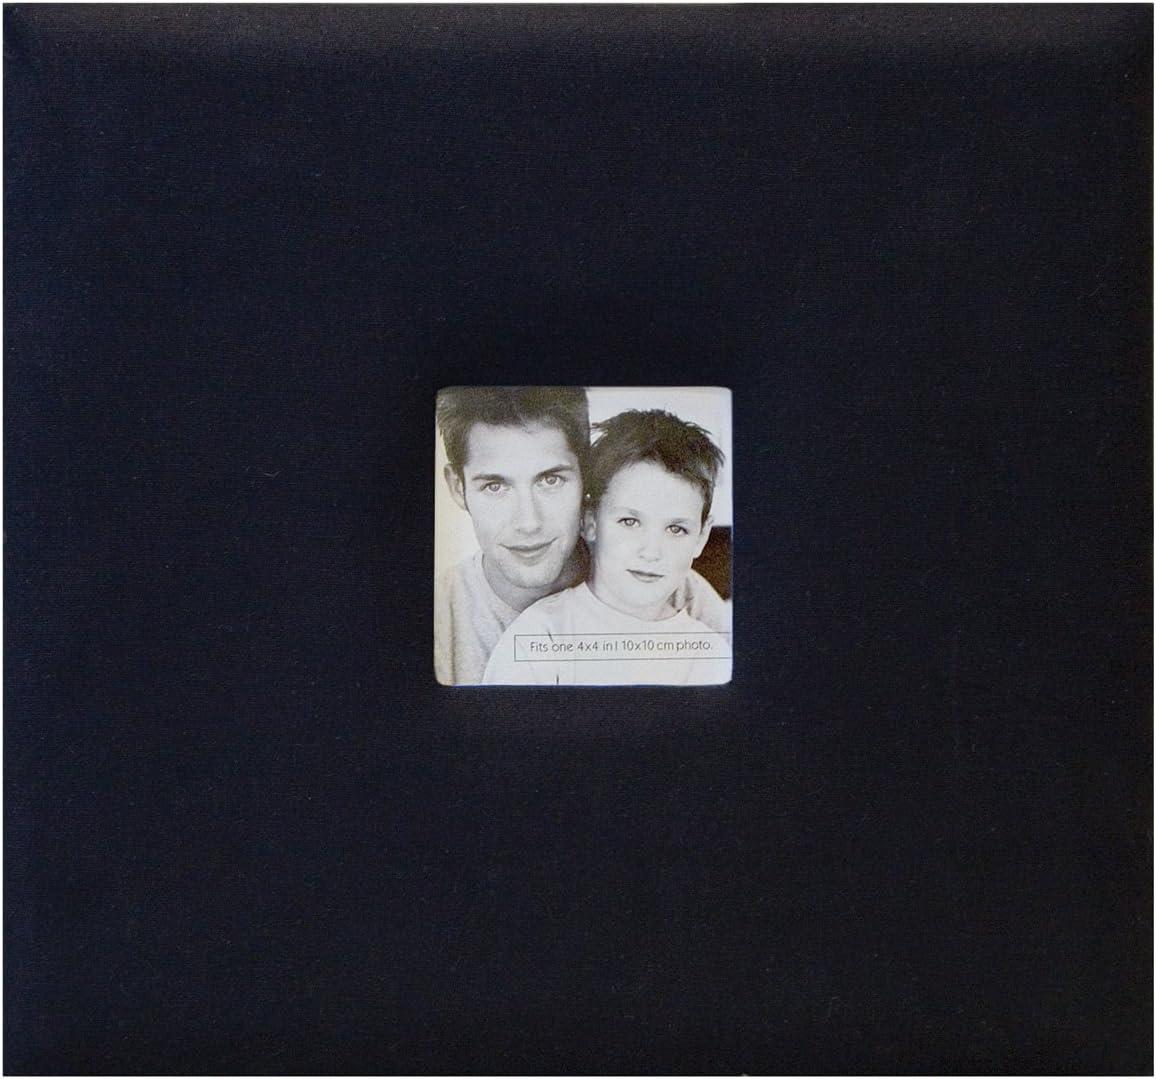 Red MBI 9.6x8.5 Inch Fashion Fabric Post Bound Scrapbook 802813